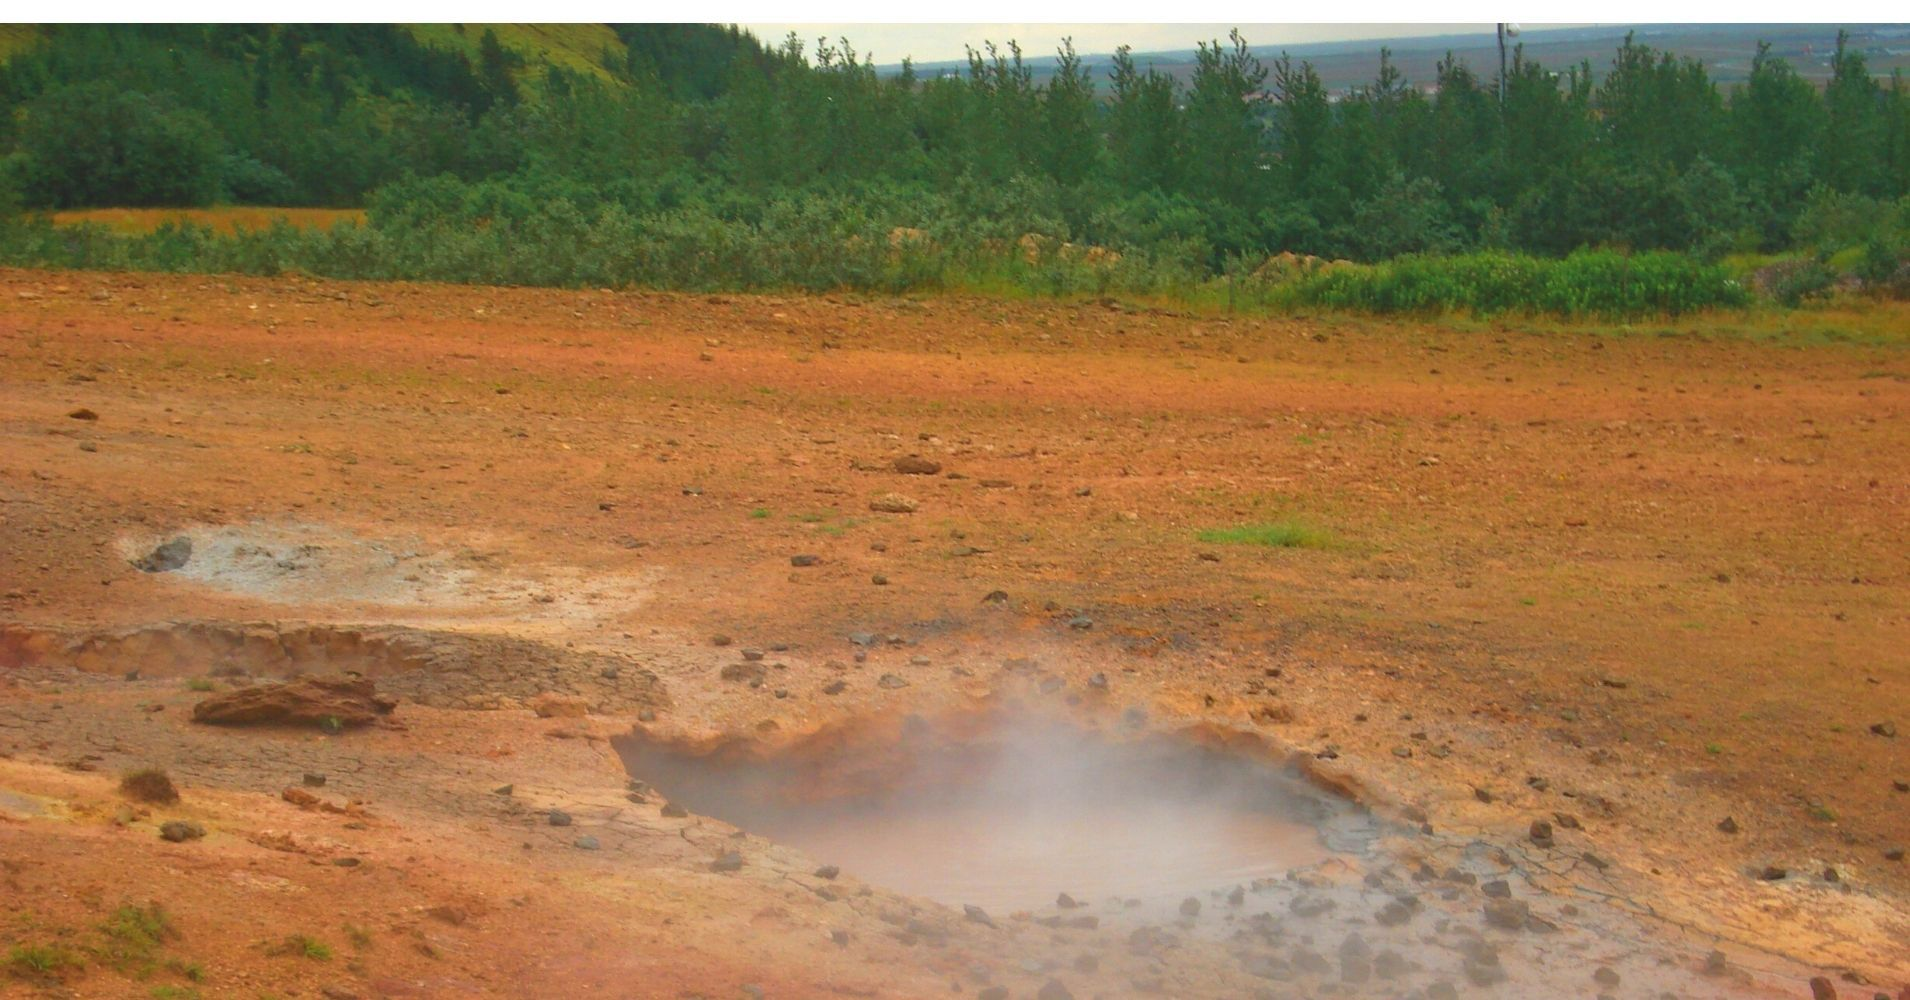 Manantiales Geotérmicos de Leirgedur. Road Trip Iceland.